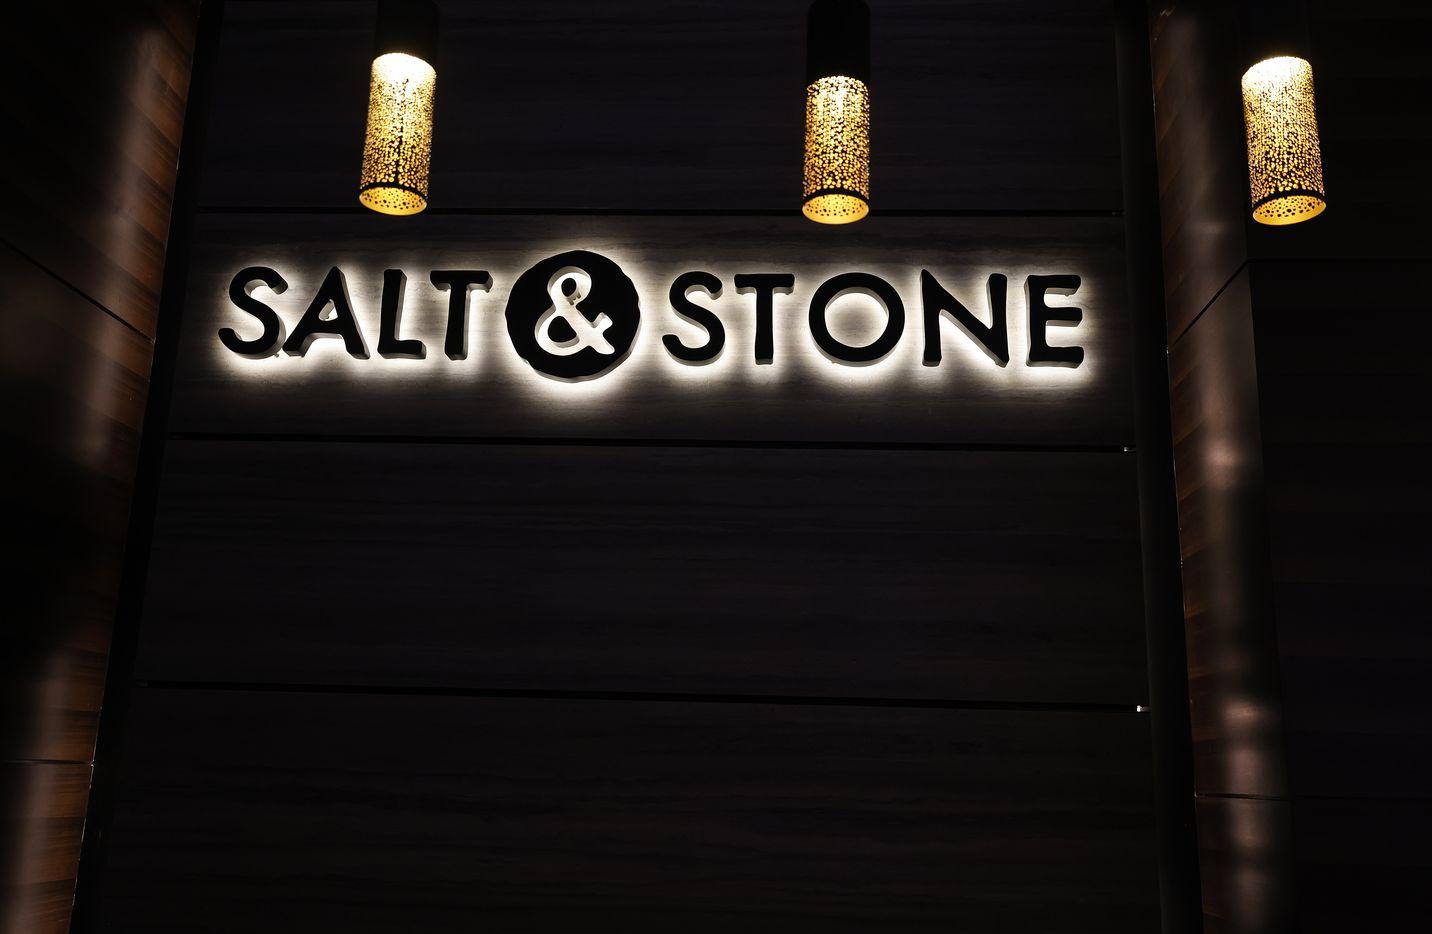 The Salt & Stone restaurant on the casino floor.